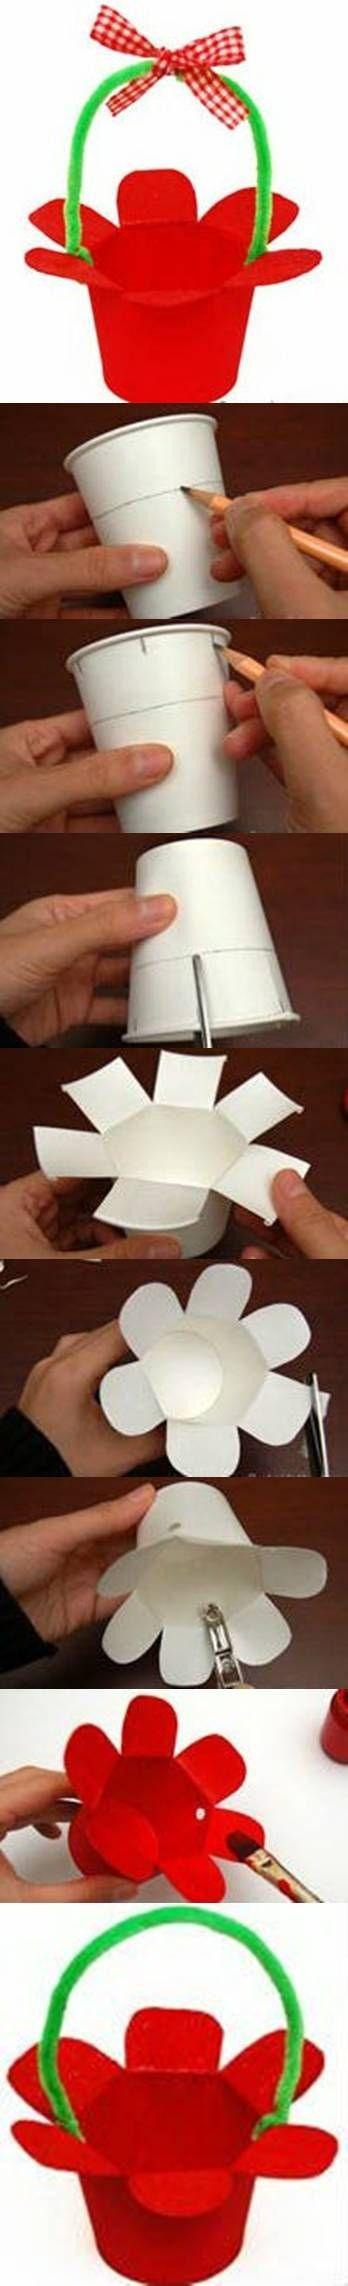 DIY Paper Cup Basket DIY Paper Cup Basket by diyforever